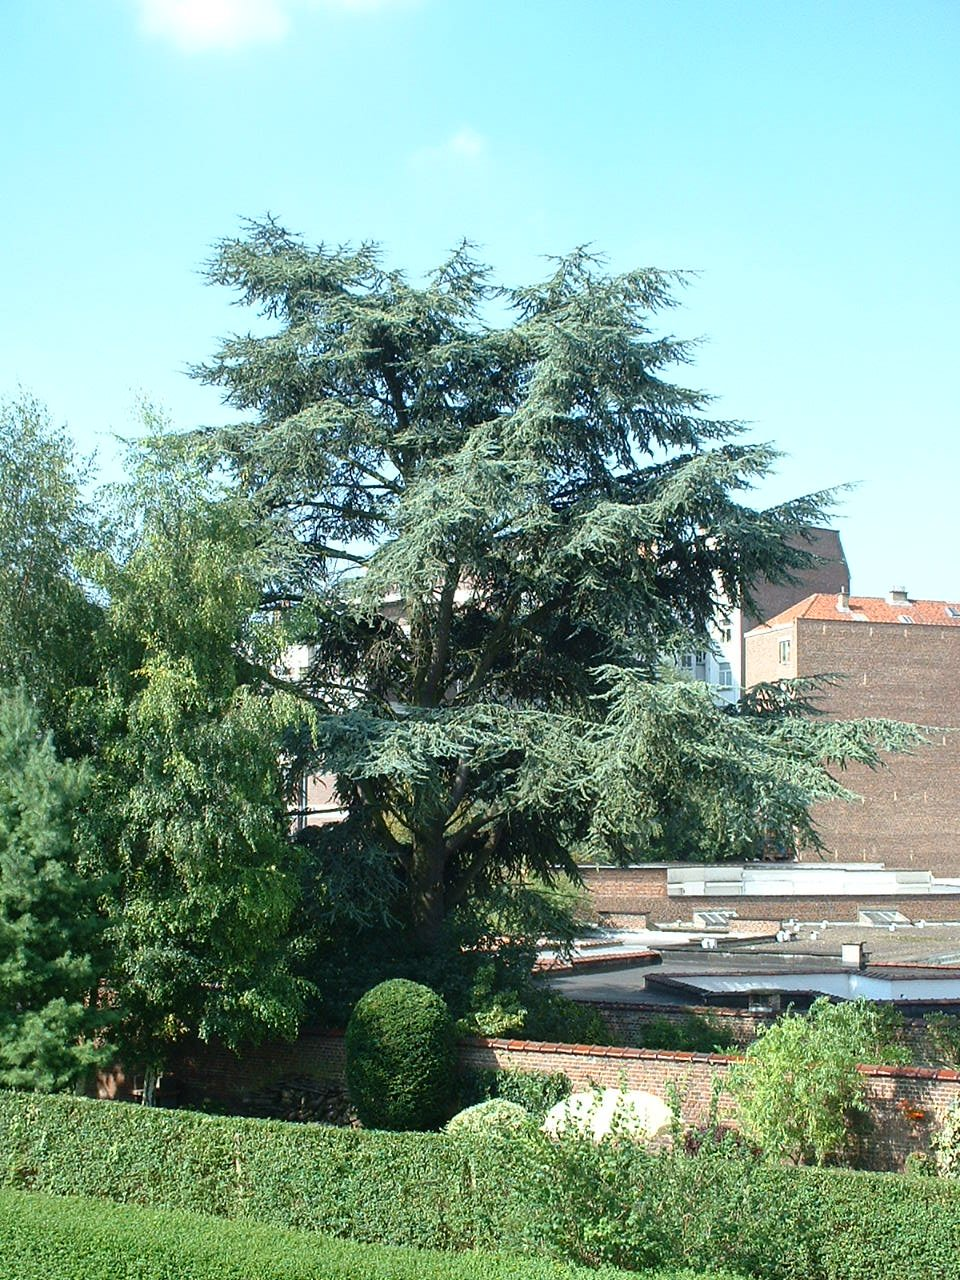 Cèdre bleu de l'Atlas – Woluwé-Saint-Lambert, Avenue A.J. Slegers, 393 –  14 Août 2002